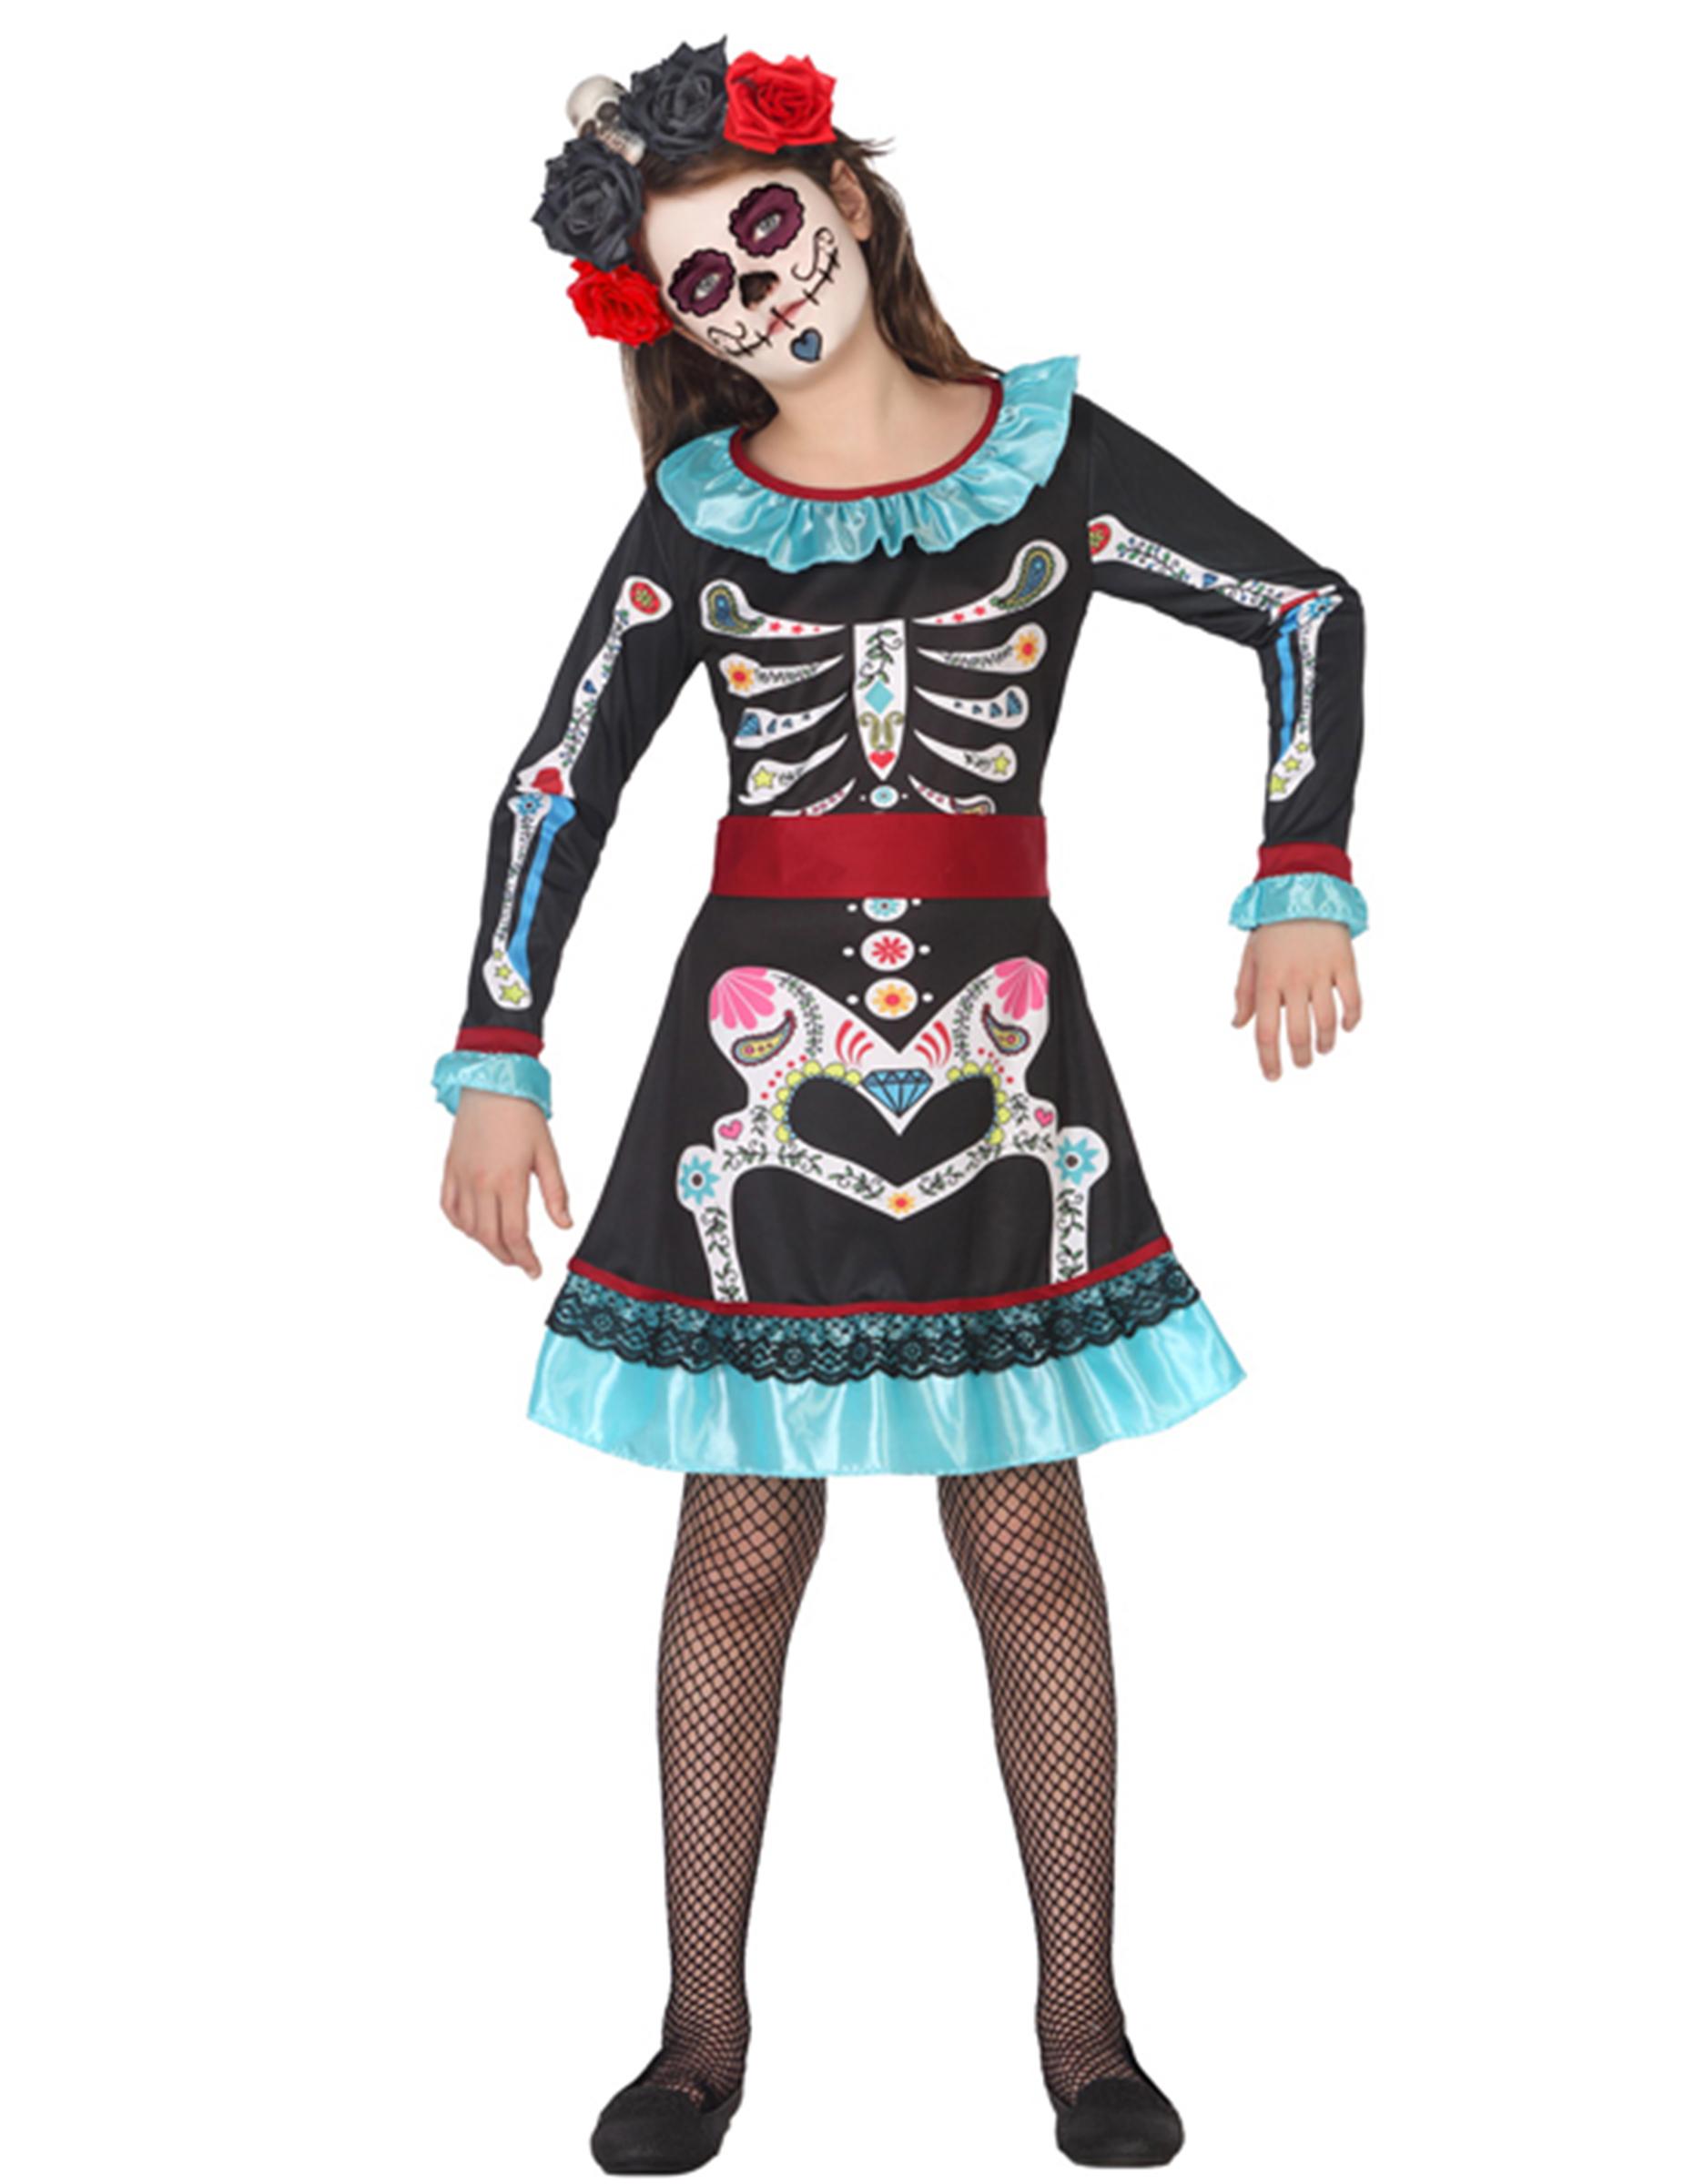 dia de los muertos skelett kost m f r kinder. Black Bedroom Furniture Sets. Home Design Ideas